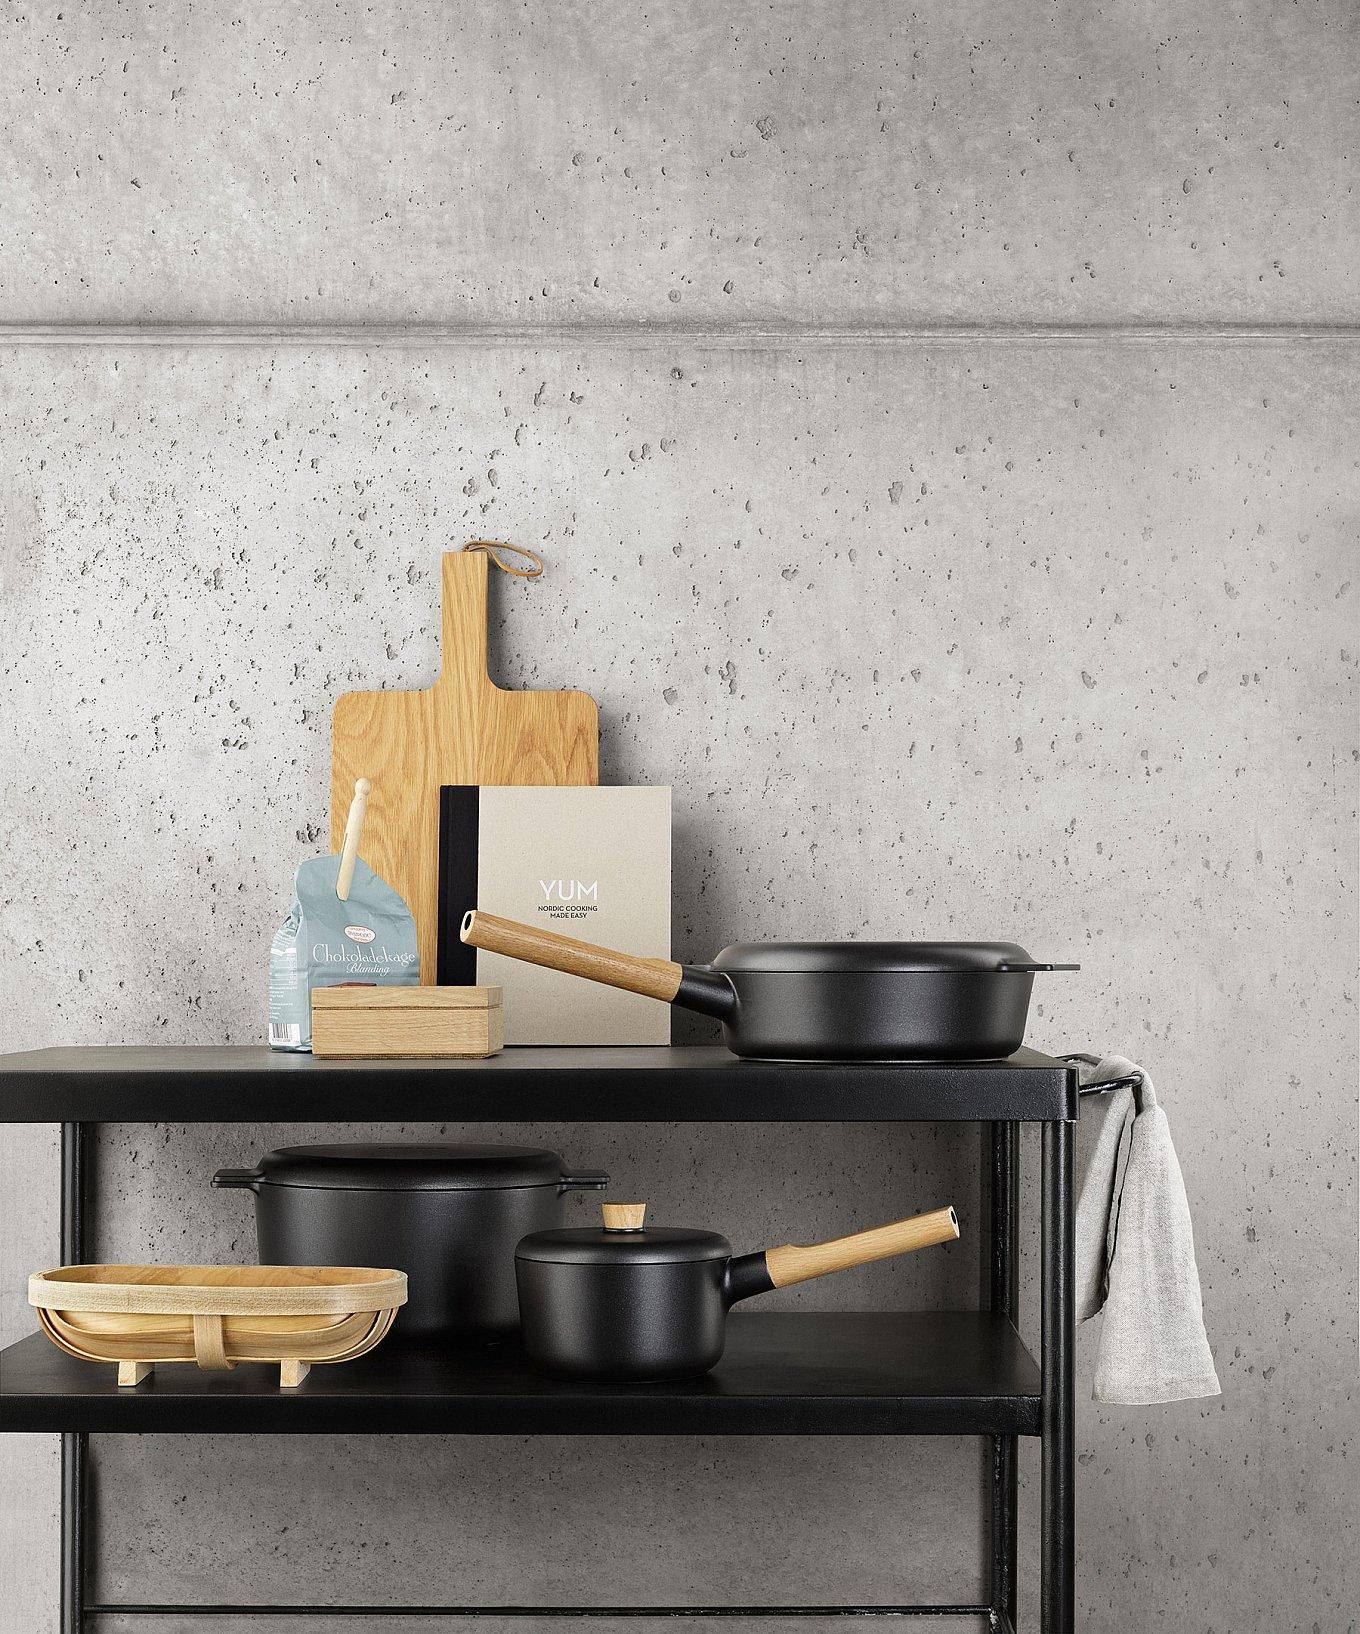 nordic-kitchen-minimalist-cookware-series-4